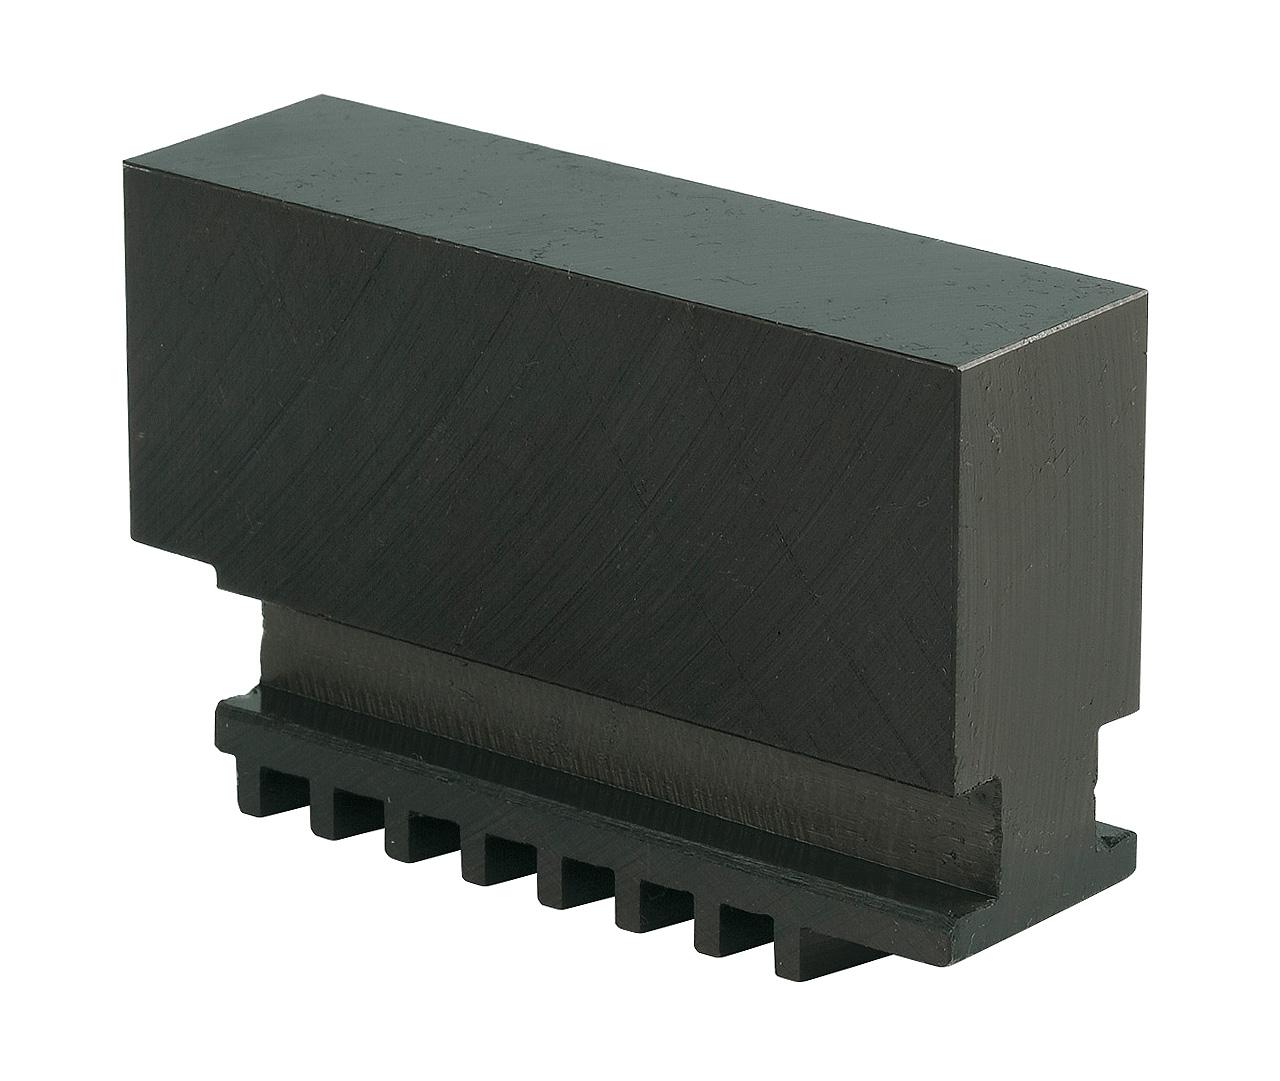 Szczęki jednolite miękkie - komplet DSJ-DK12-250 BERNARDO